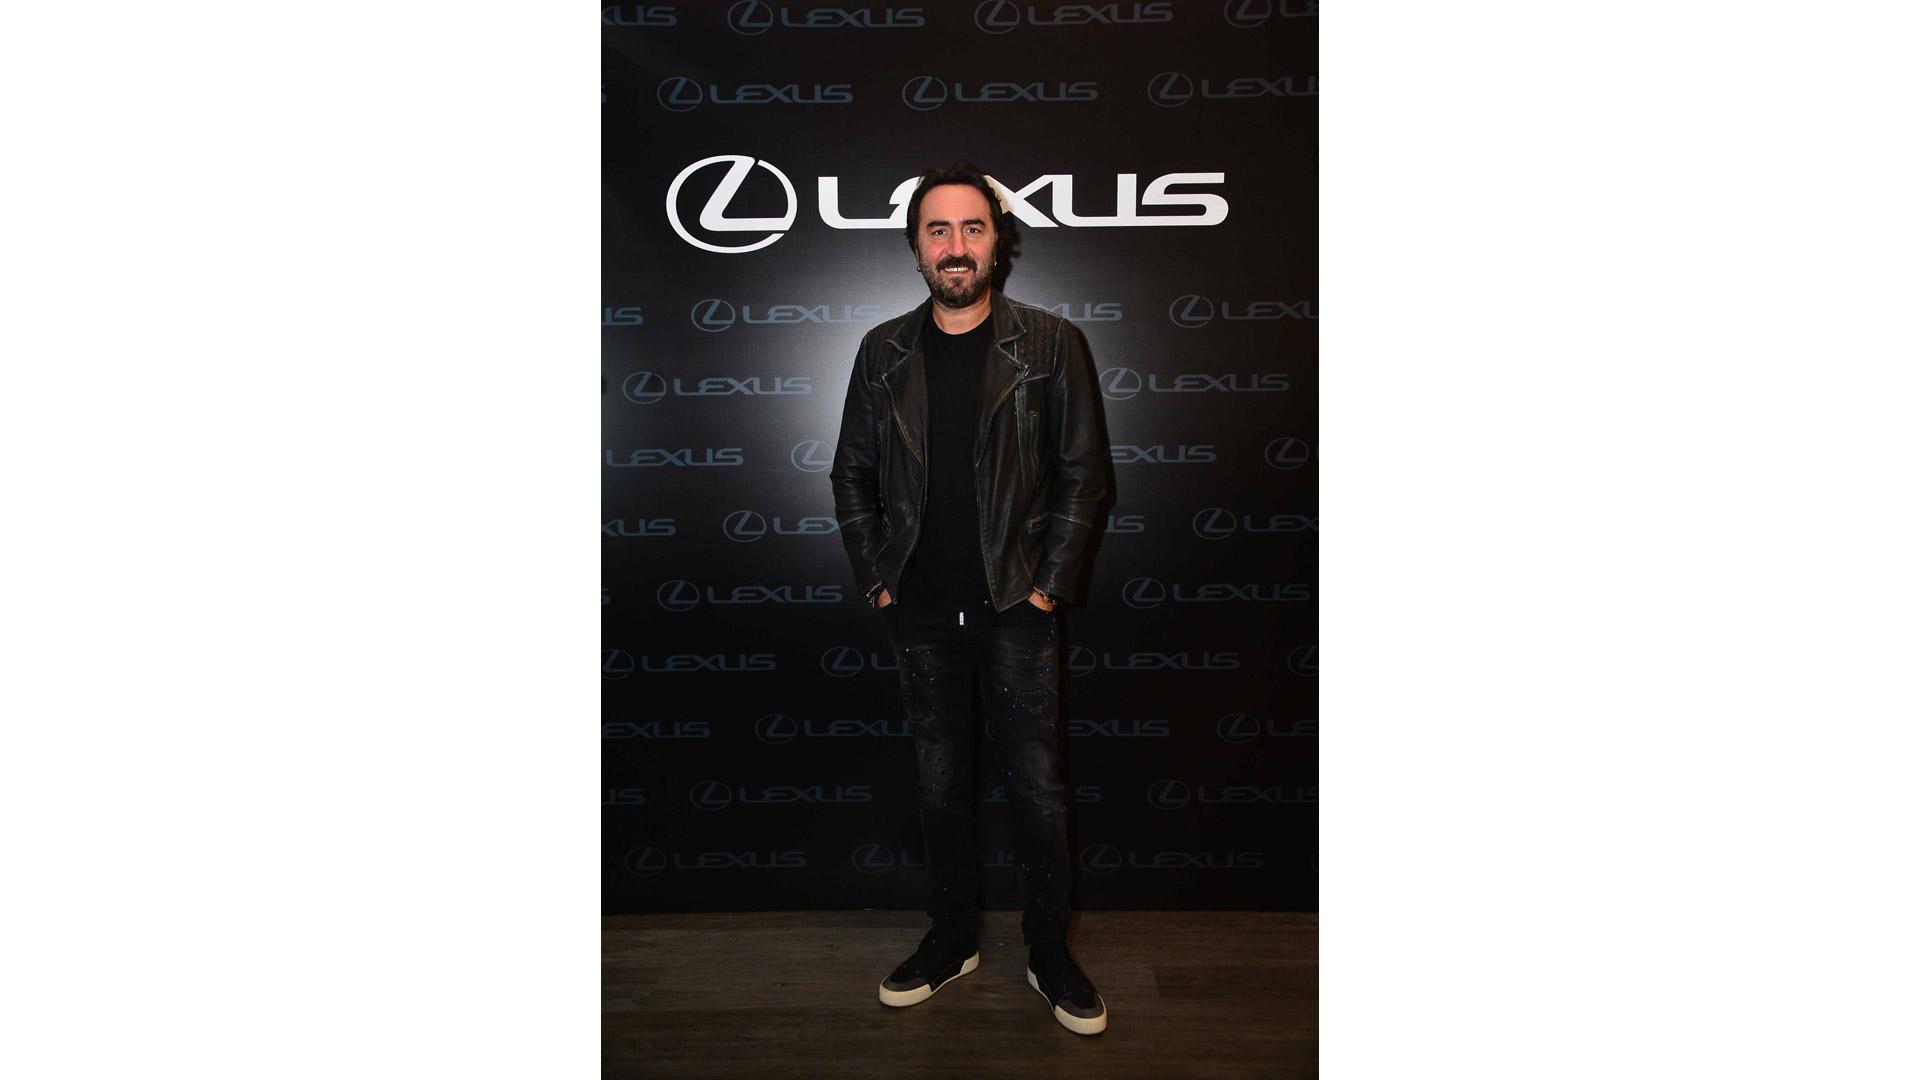 Lexus Fotograf Sergisi gallery08